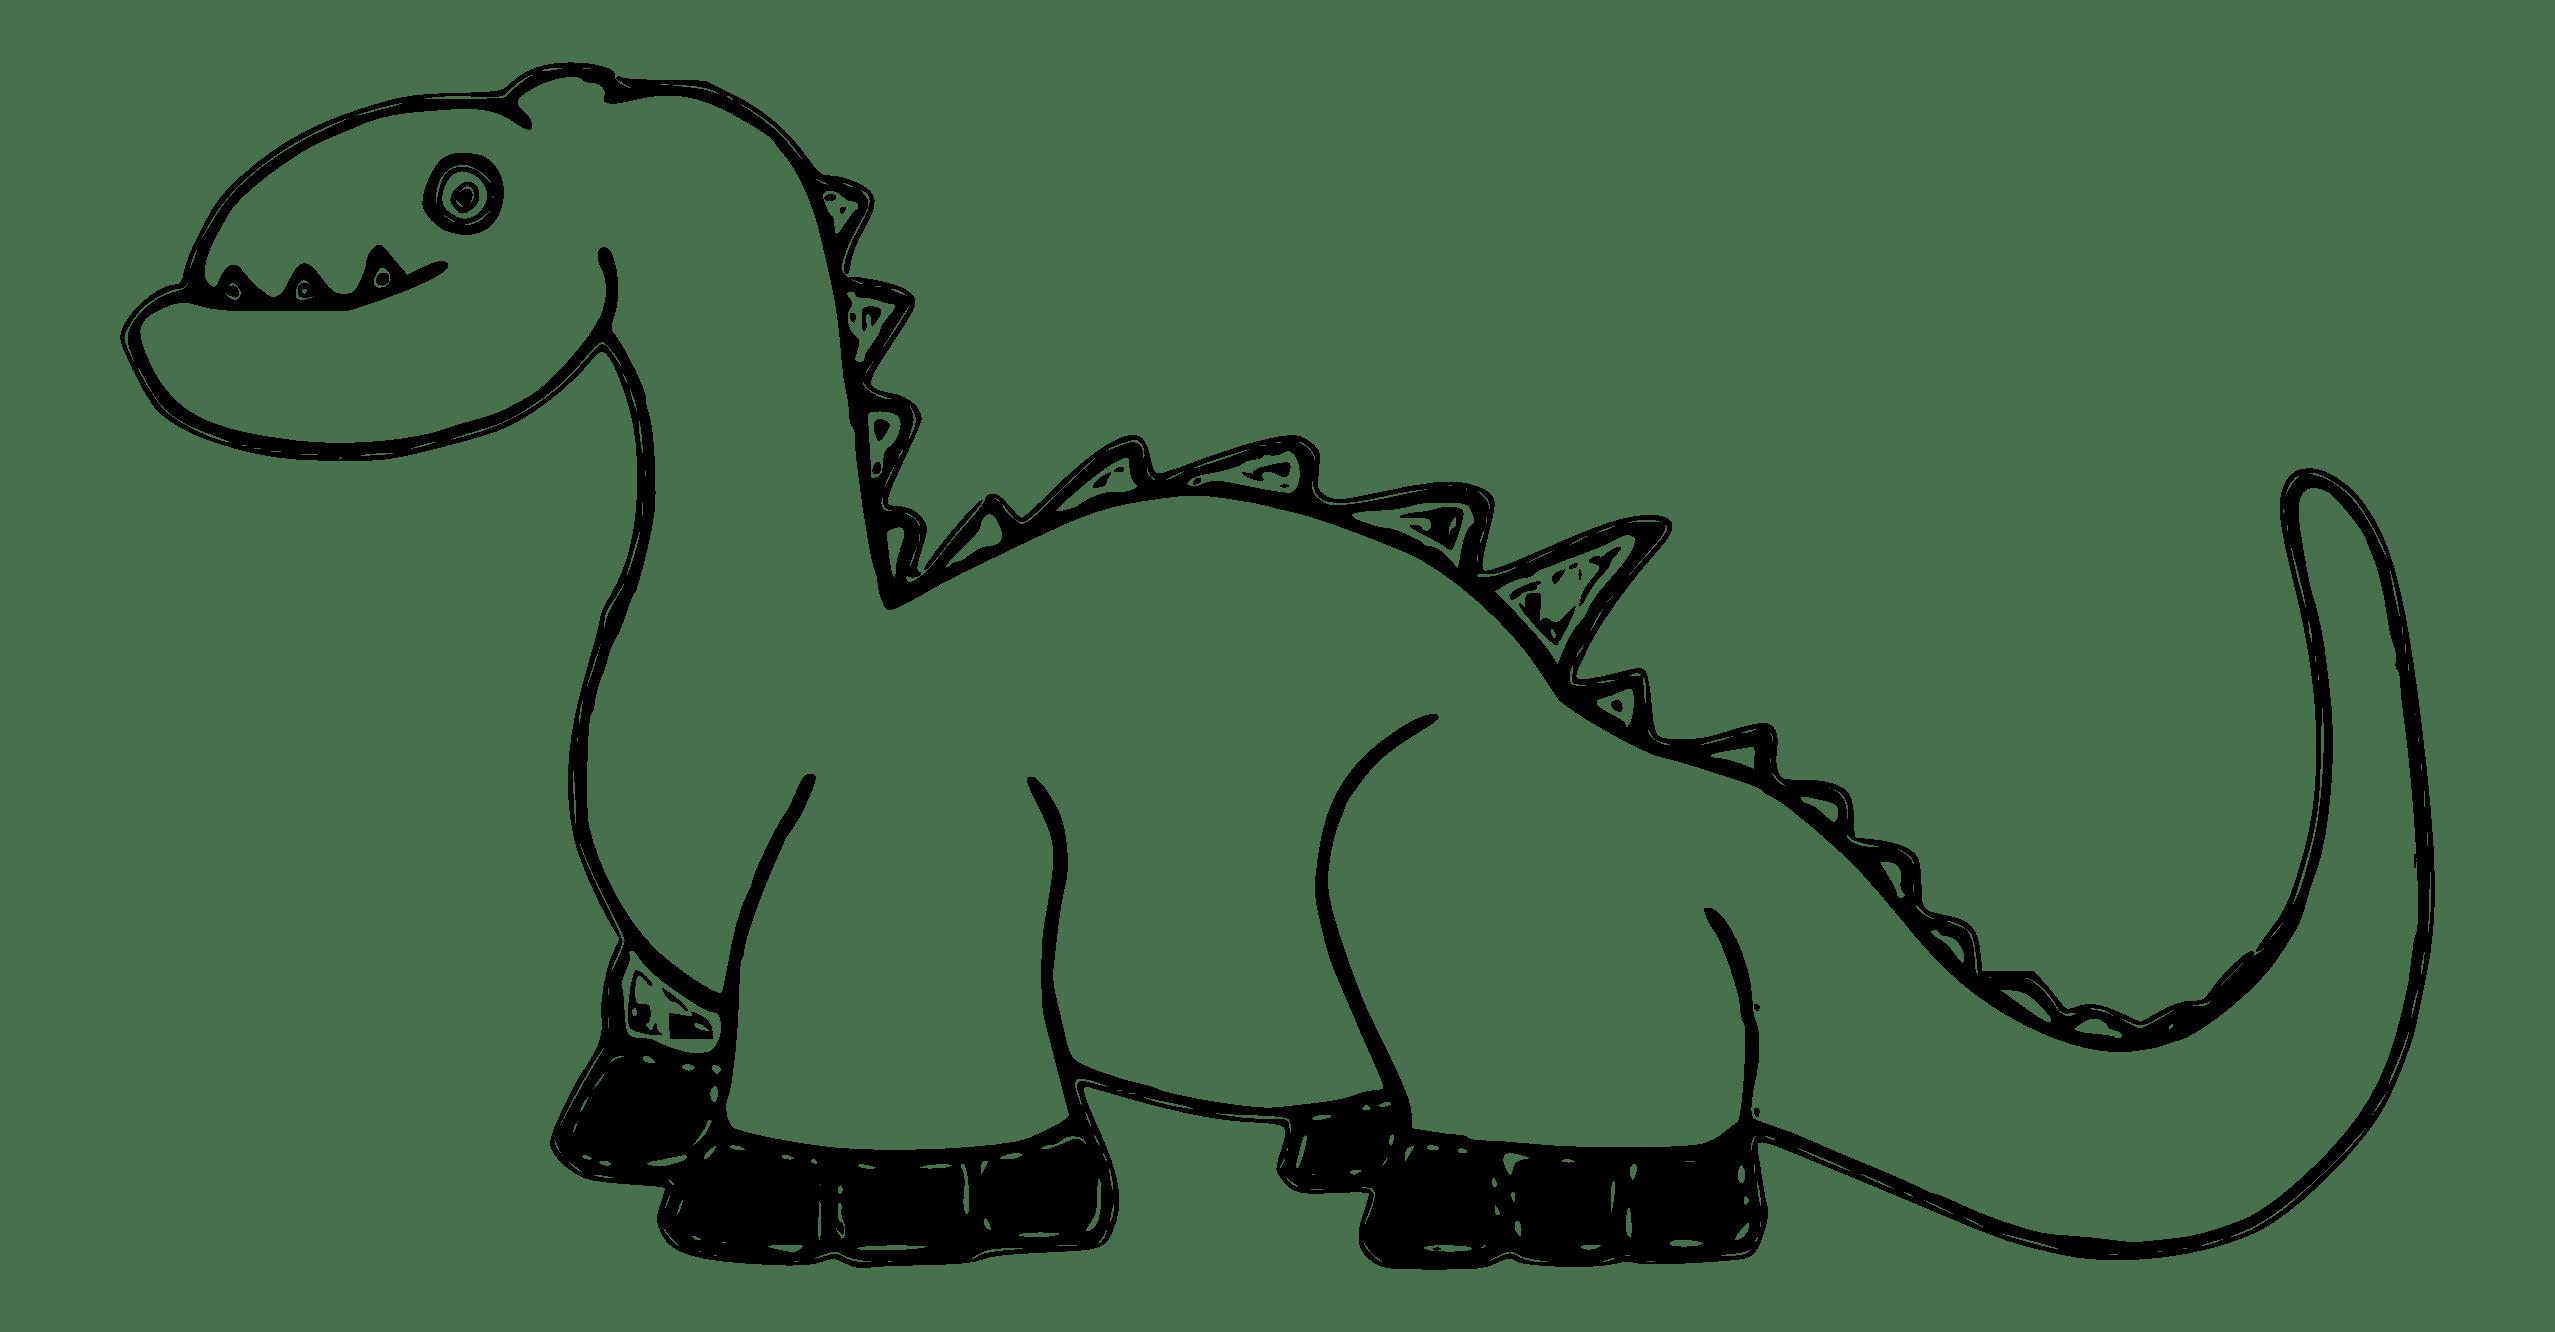 Baby Dinosaur Clip Art Black And White